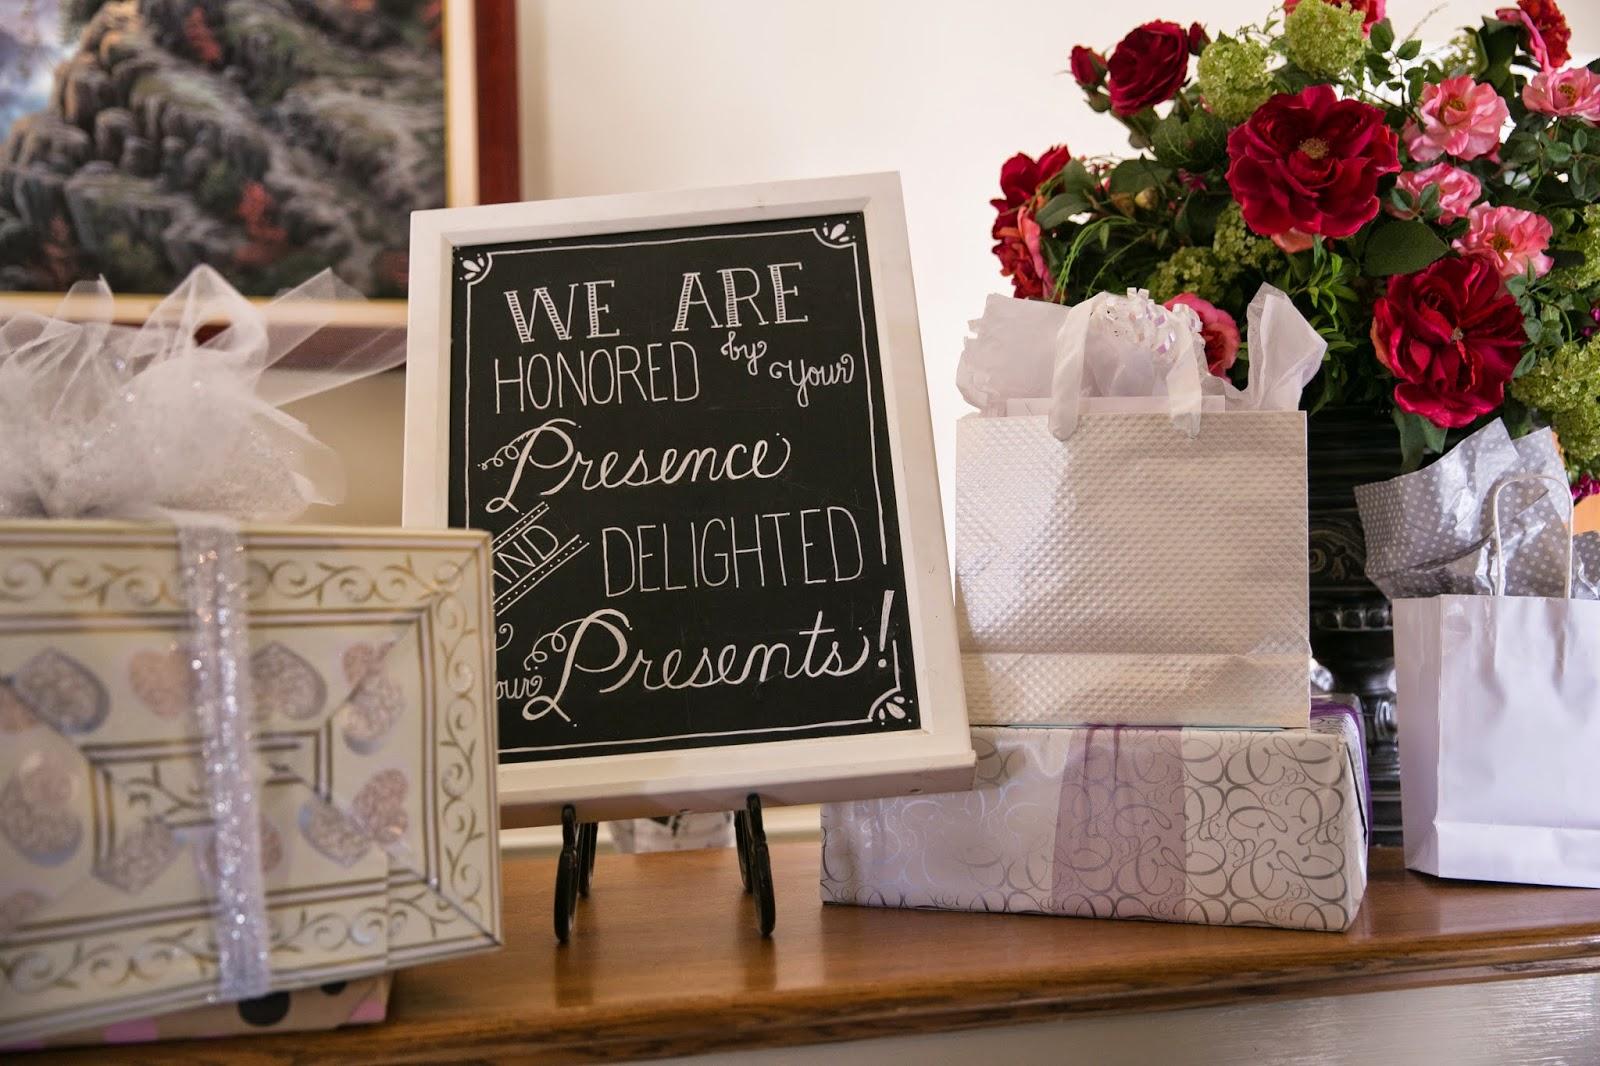 JellO Art  Wedding Venues and Locations  DIY Wedding Ideas